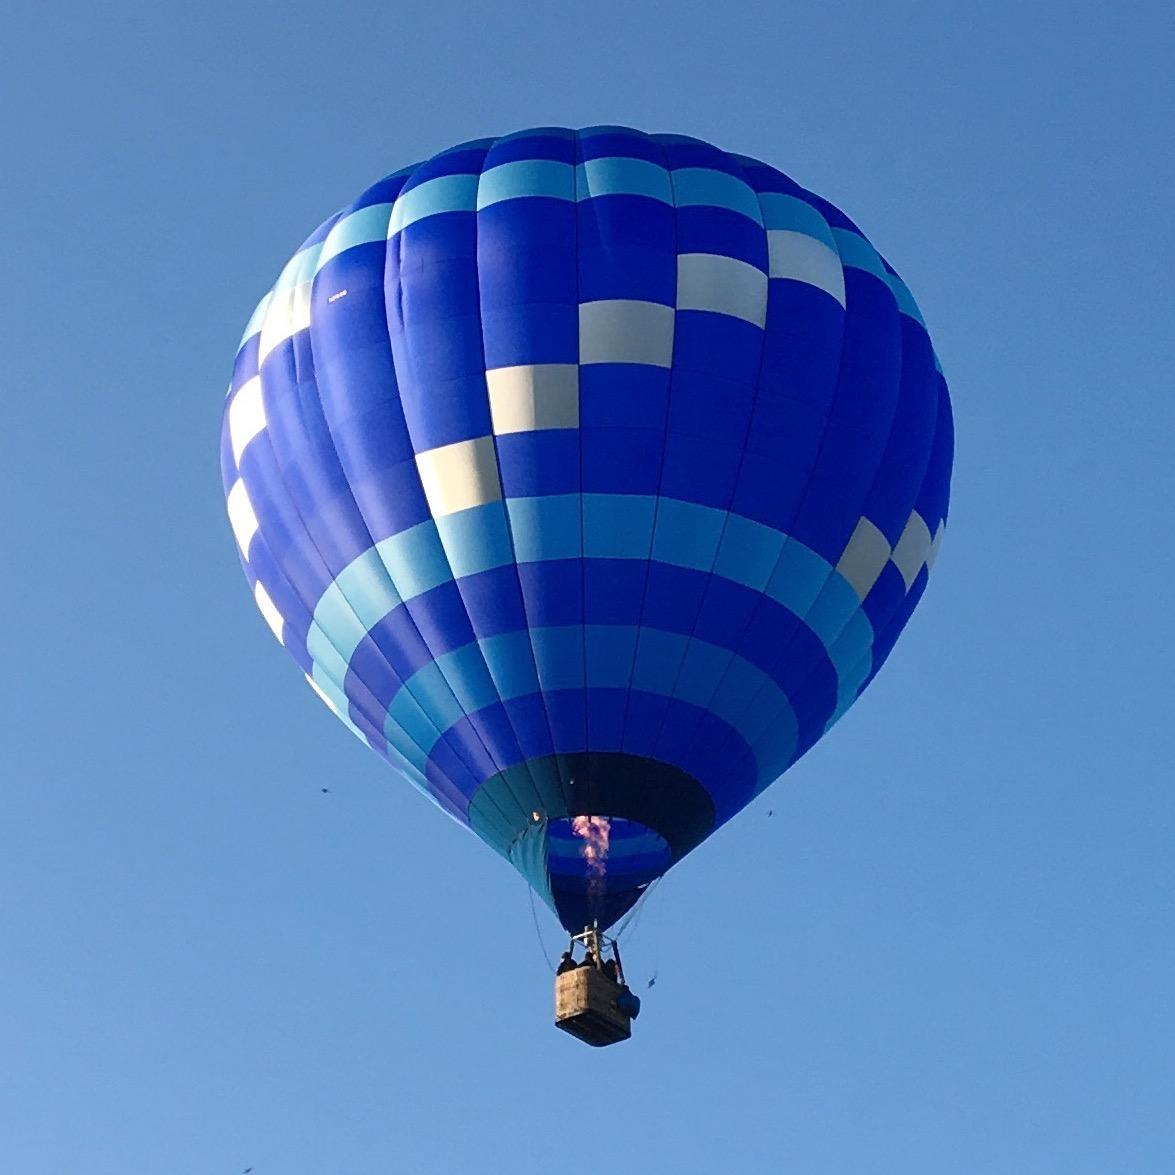 paradox_balloon.JPG